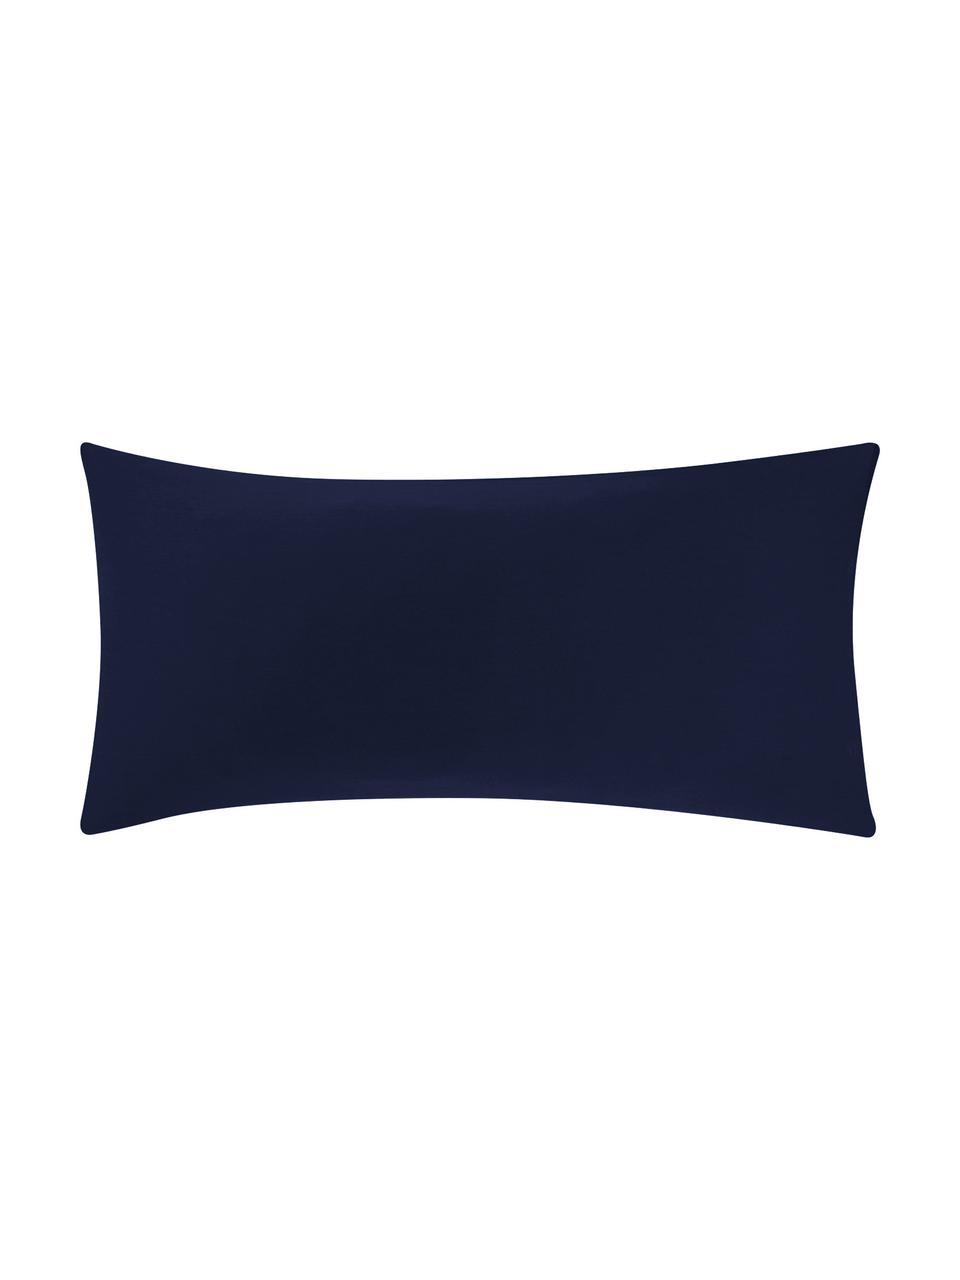 Baumwollsatin-Kopfkissenbezüge Comfort in Dunkelblau, 2 Stück, Webart: Satin Fadendichte 250 TC,, Dunkelblau, 40 x 80 cm